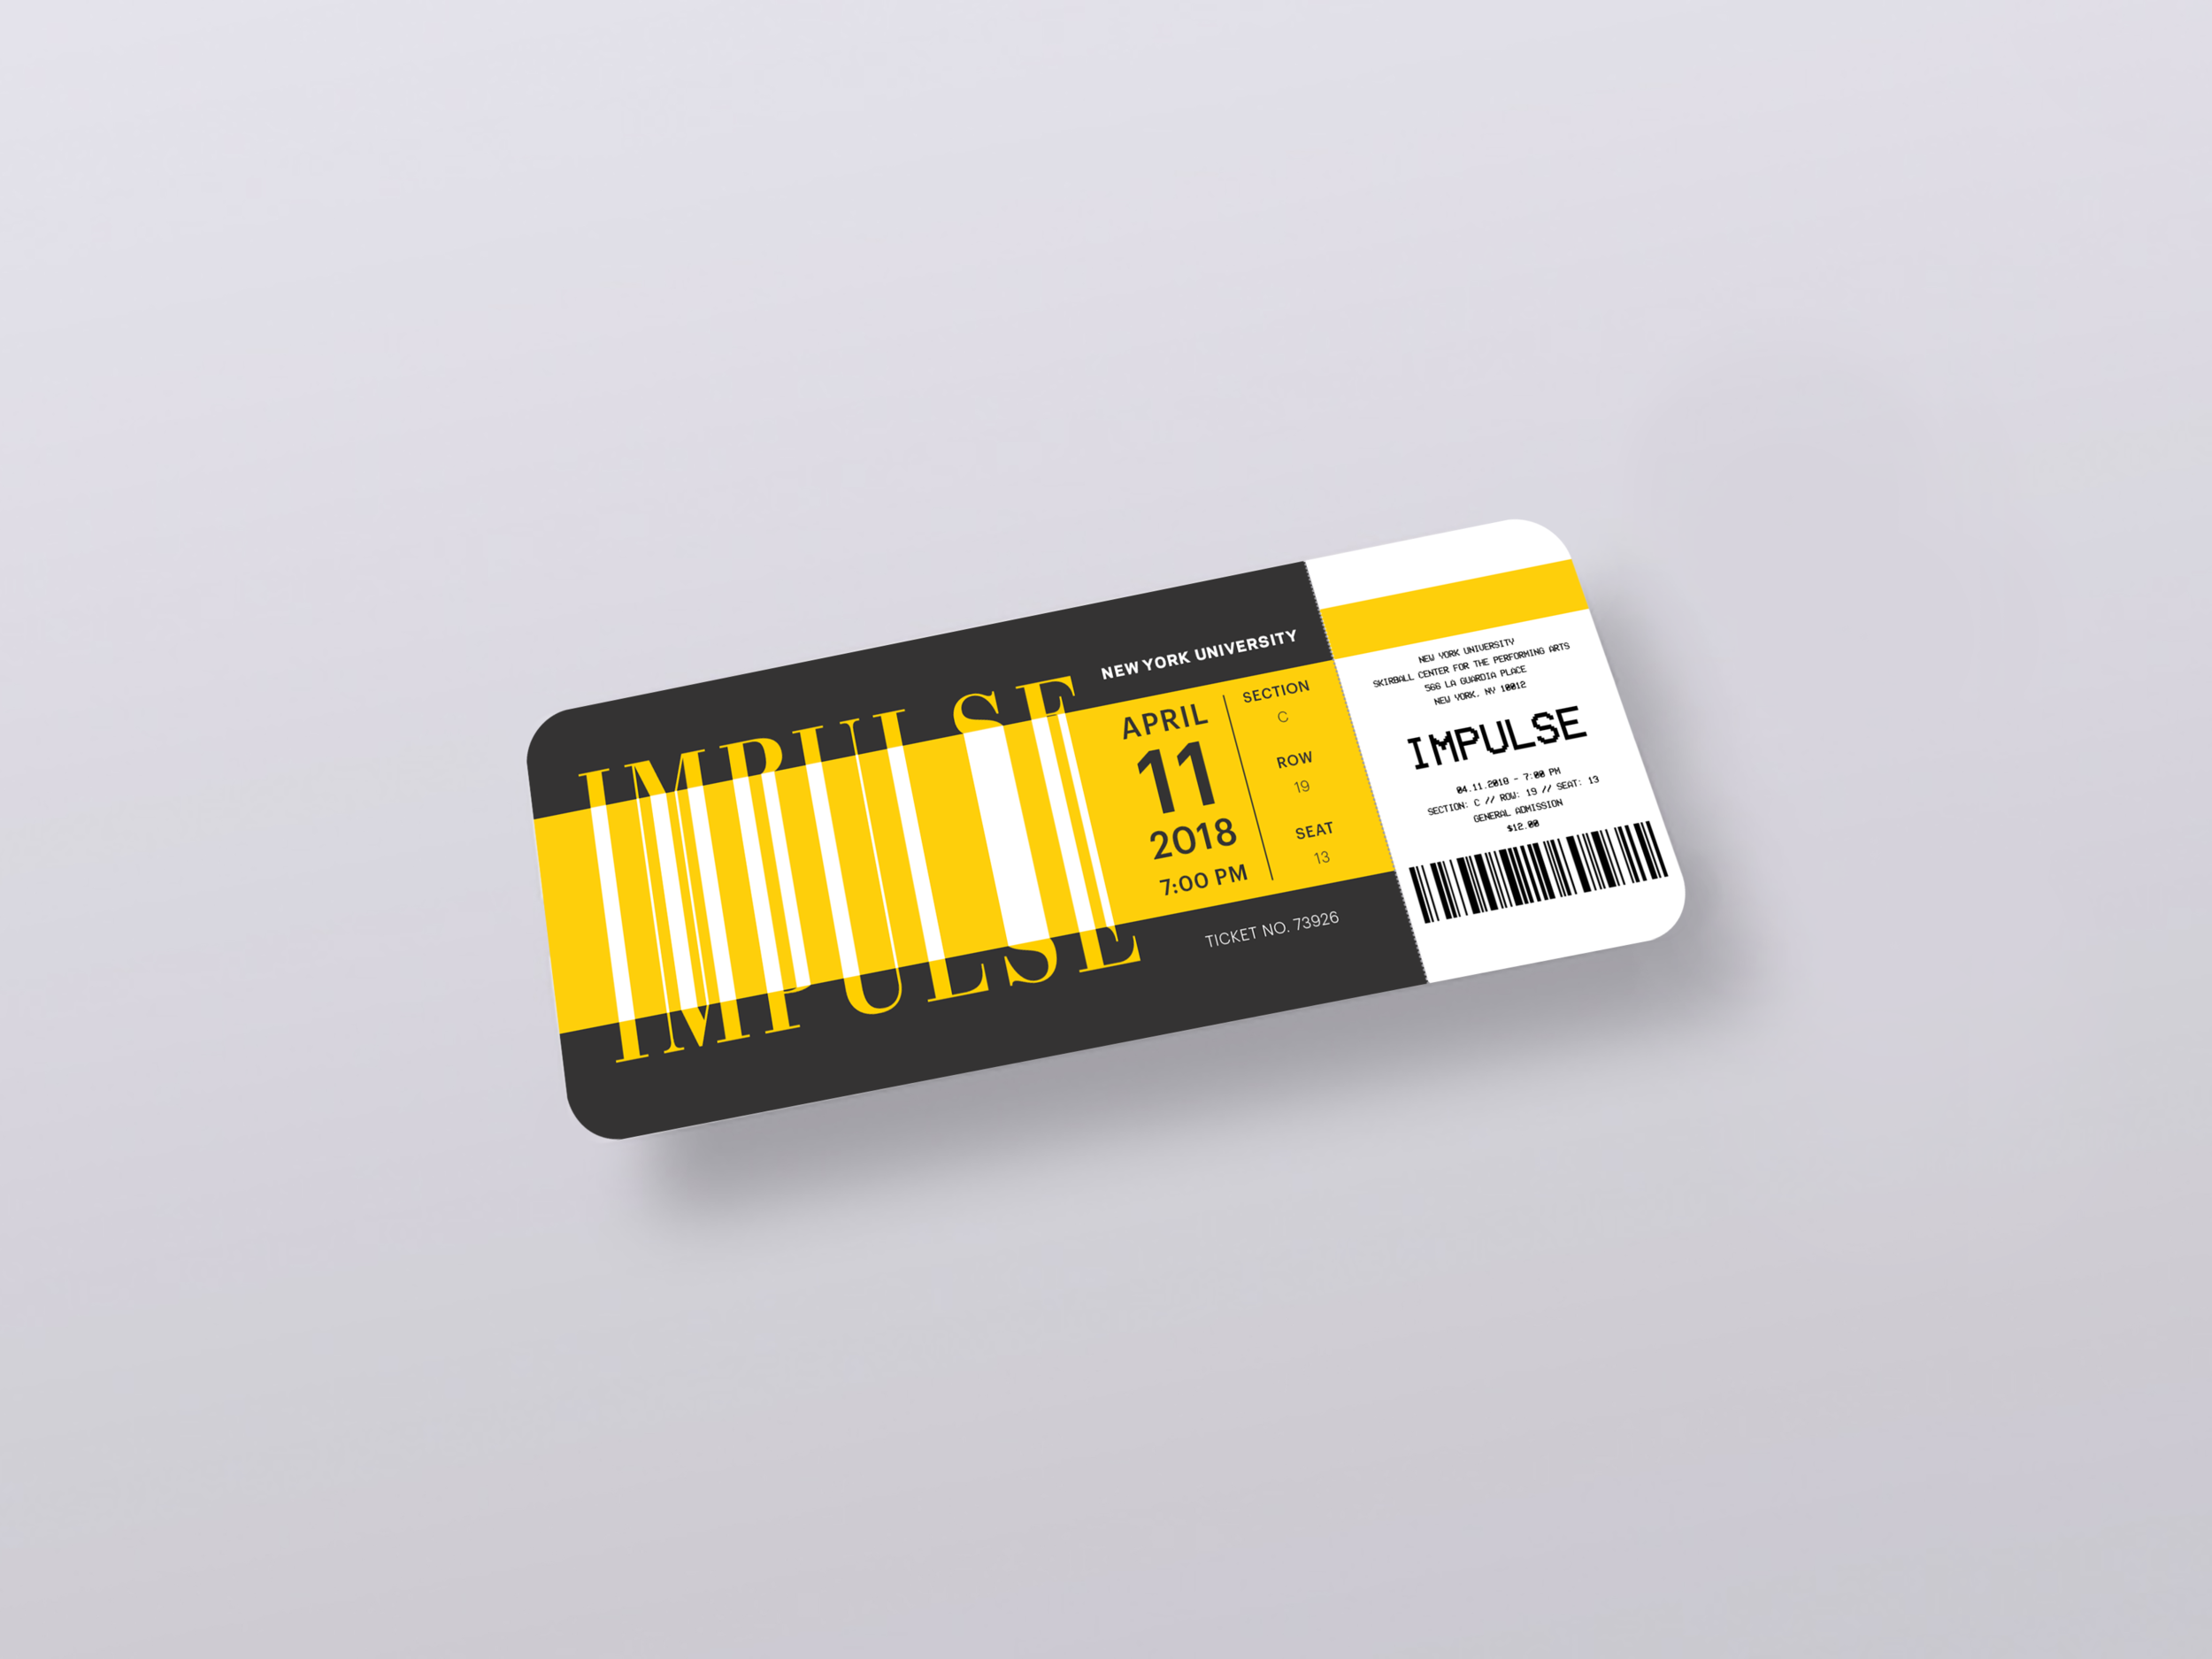 ticket_mockup_2.png